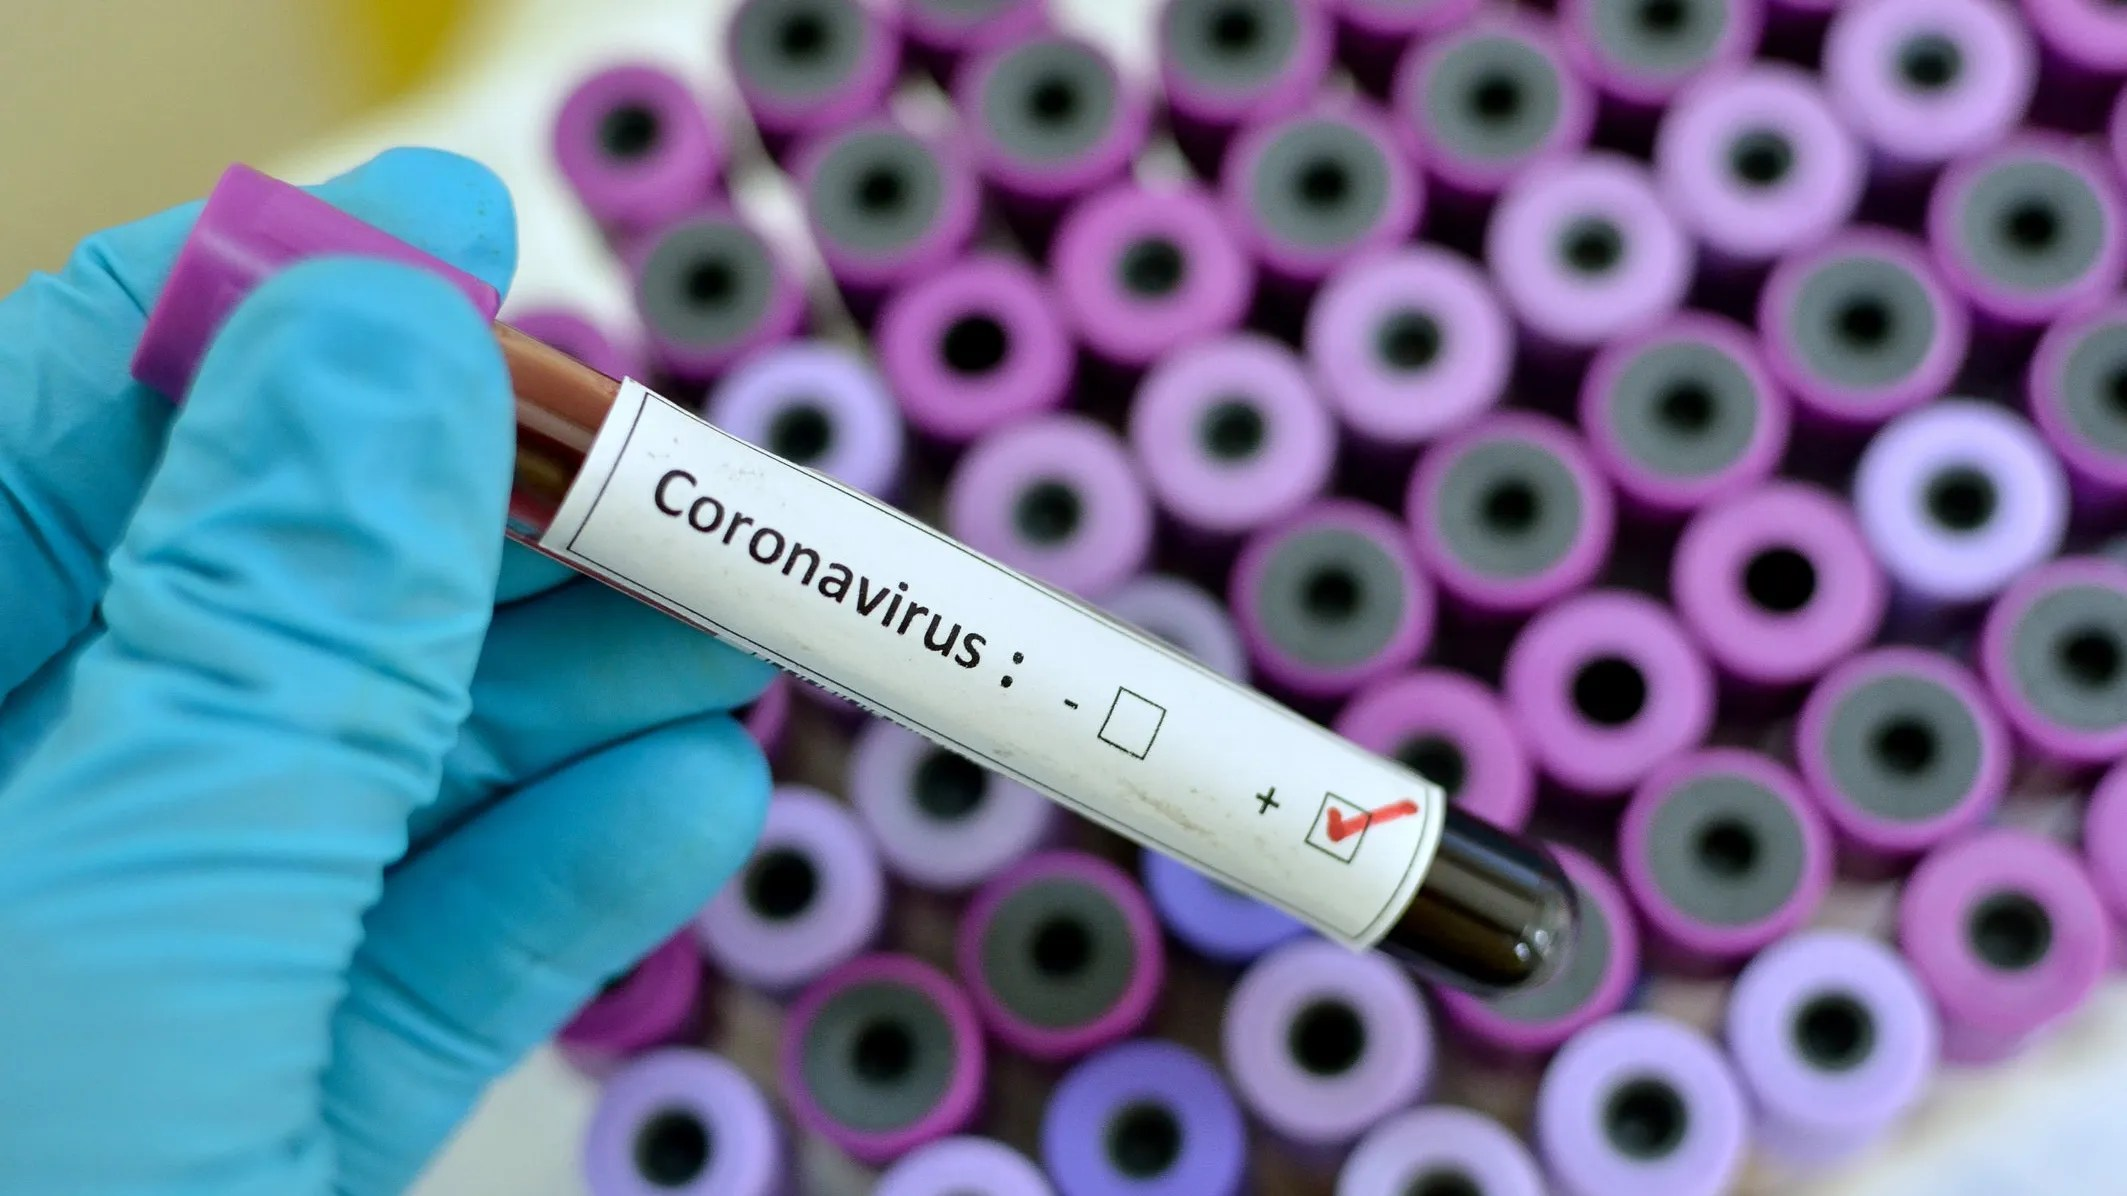 Plague Inc. video game more popular after coronavirus outbreak